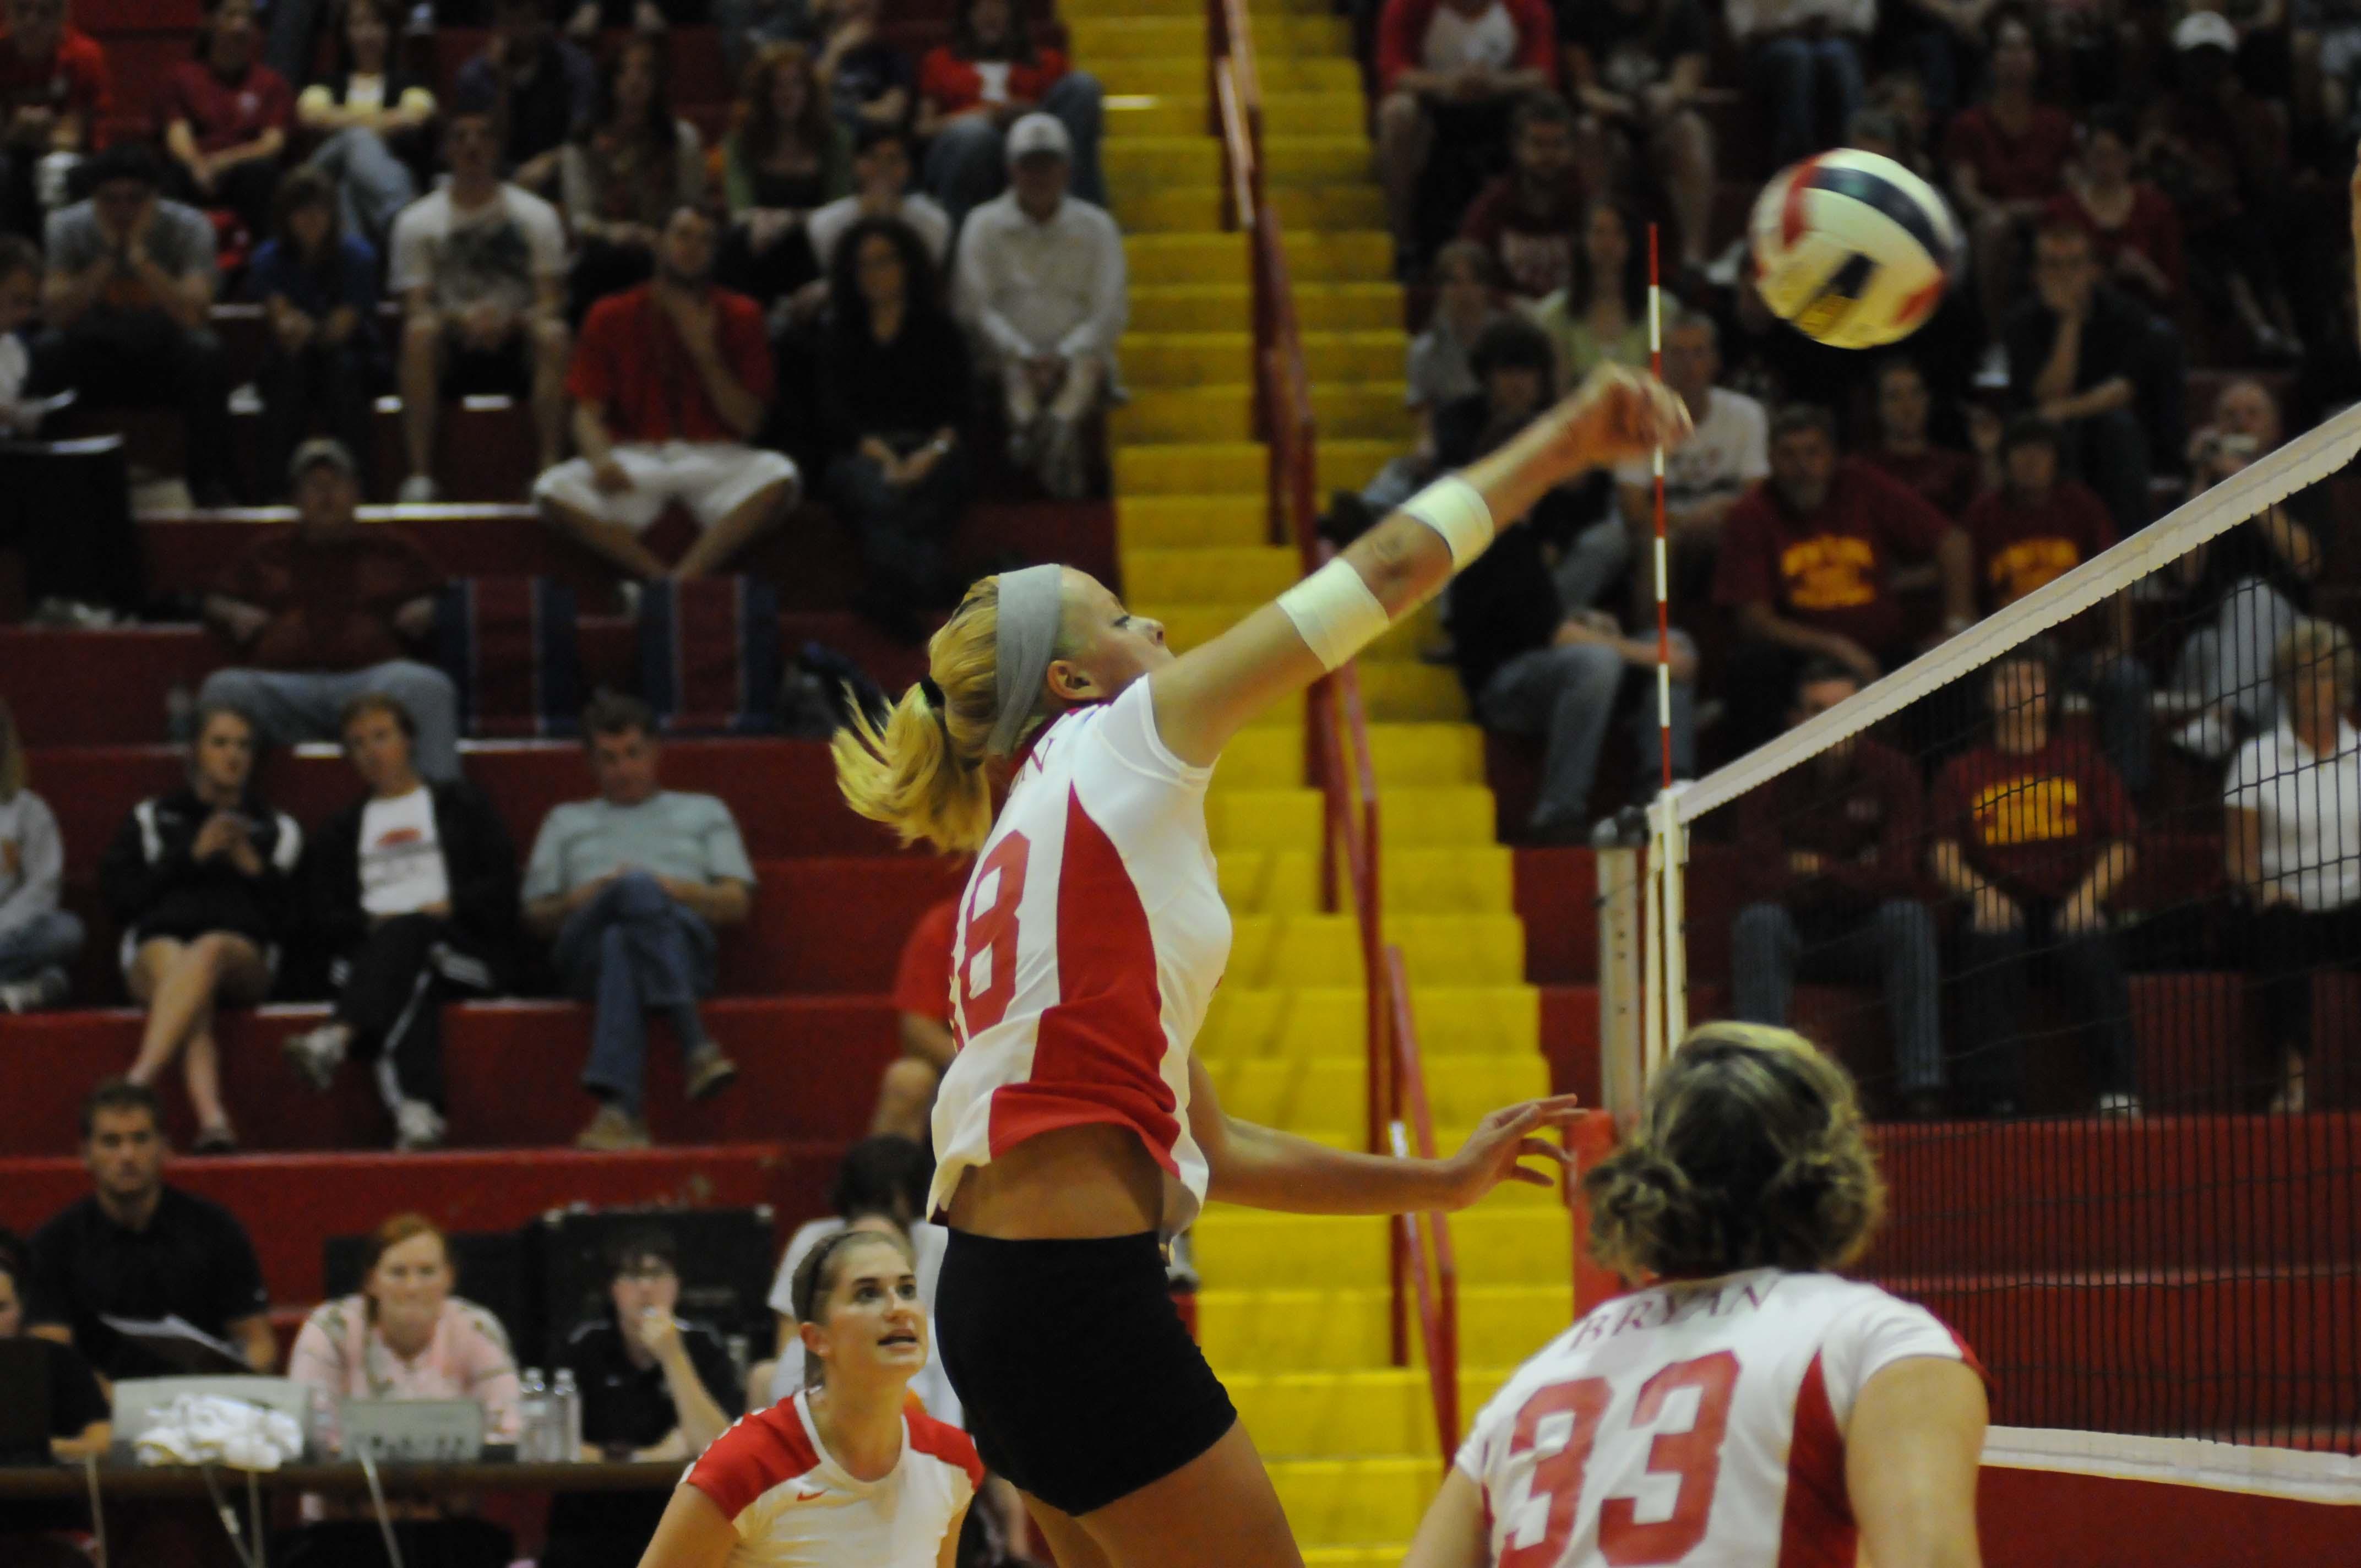 Wallpaper Engine Falling Girl Girls Volleyball Shorts Falling Off